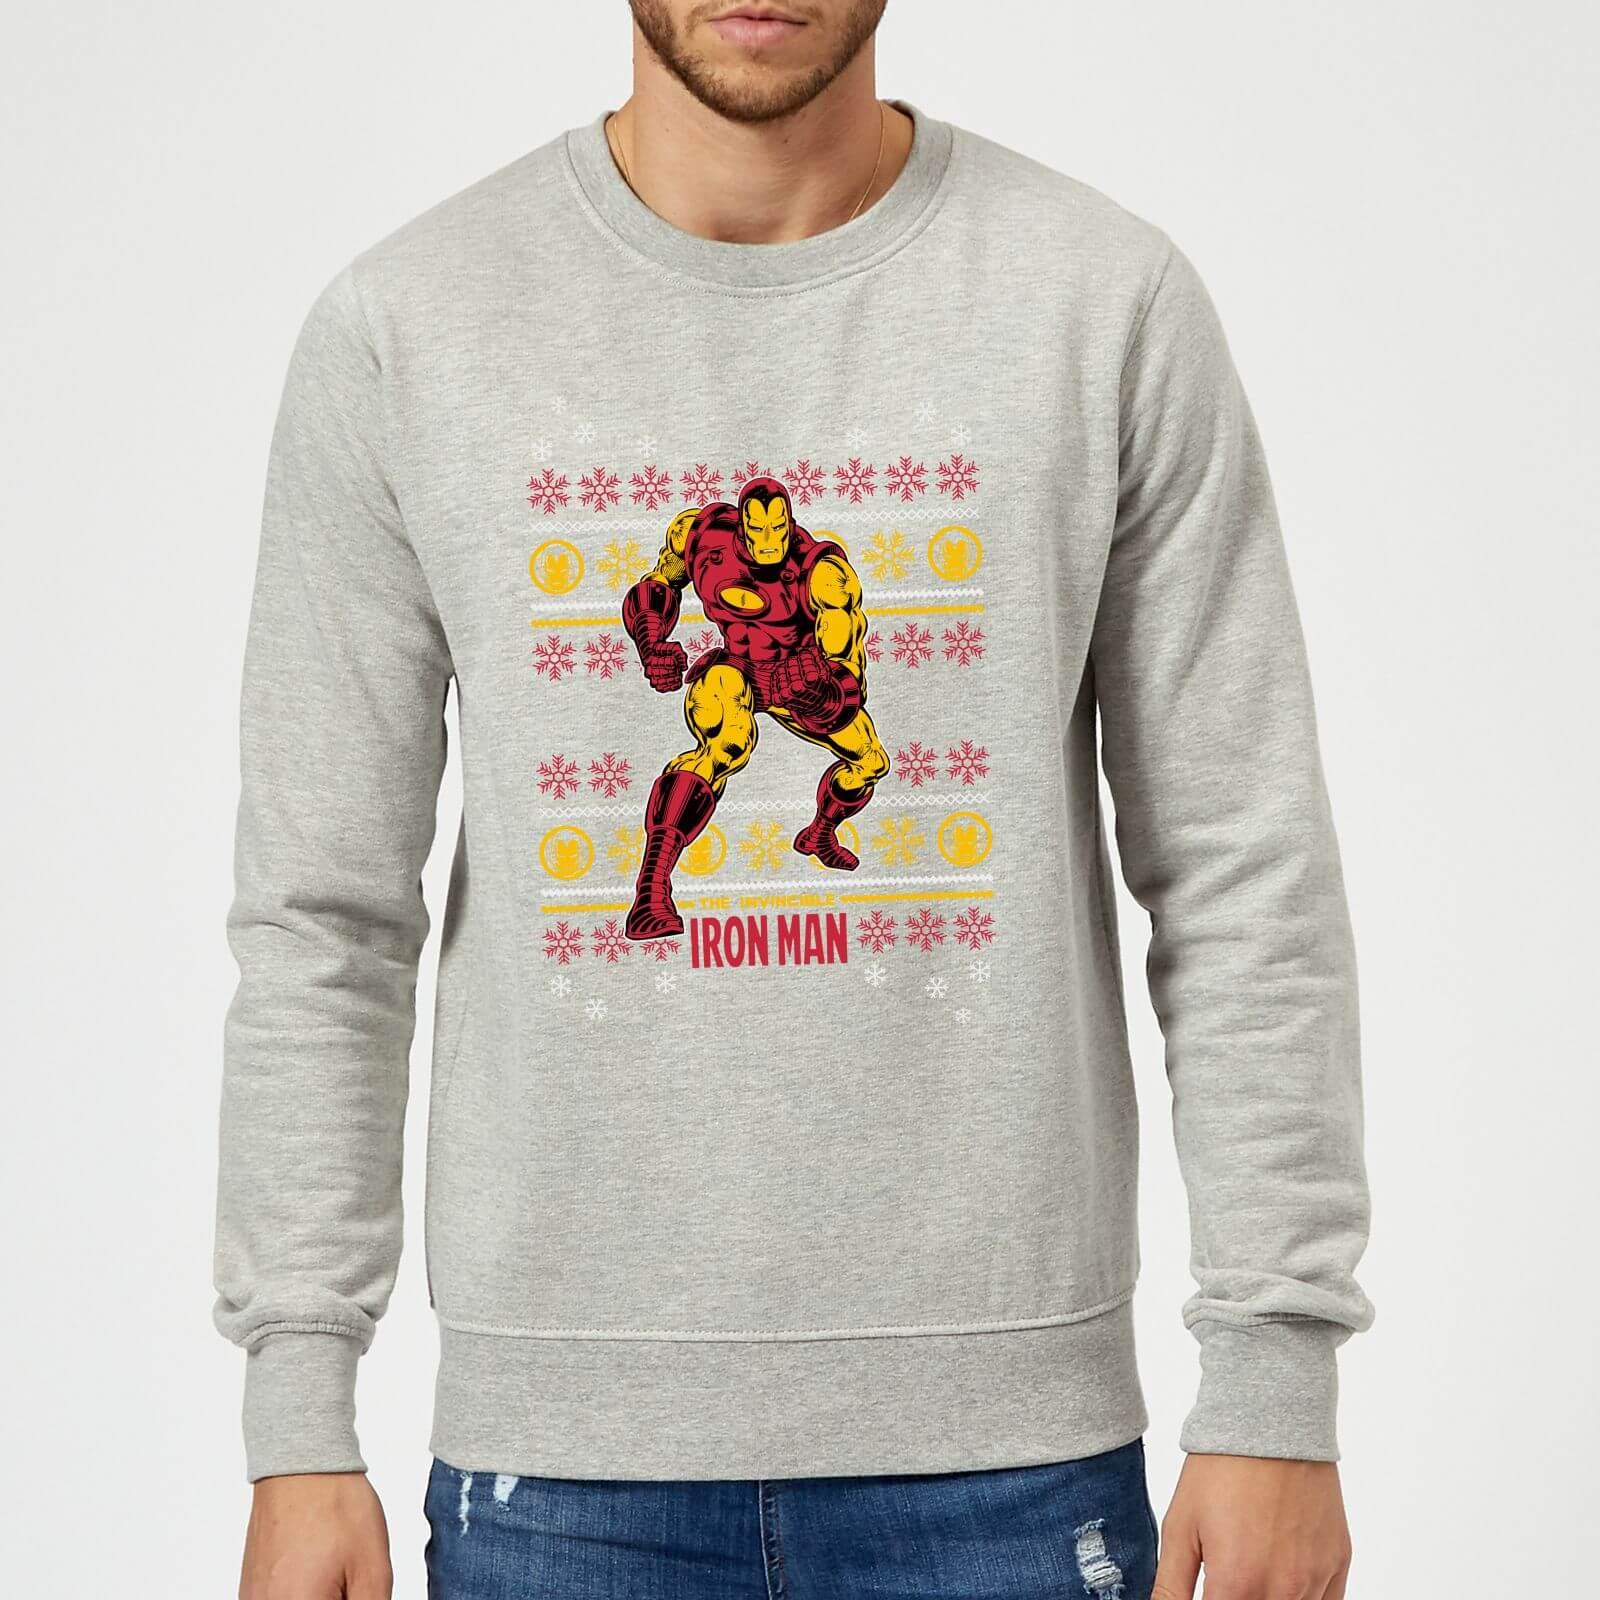 Kersttrui Man.Marvel Comics The Invincible Iron Man Kersttrui Grijs Zavvi Nl